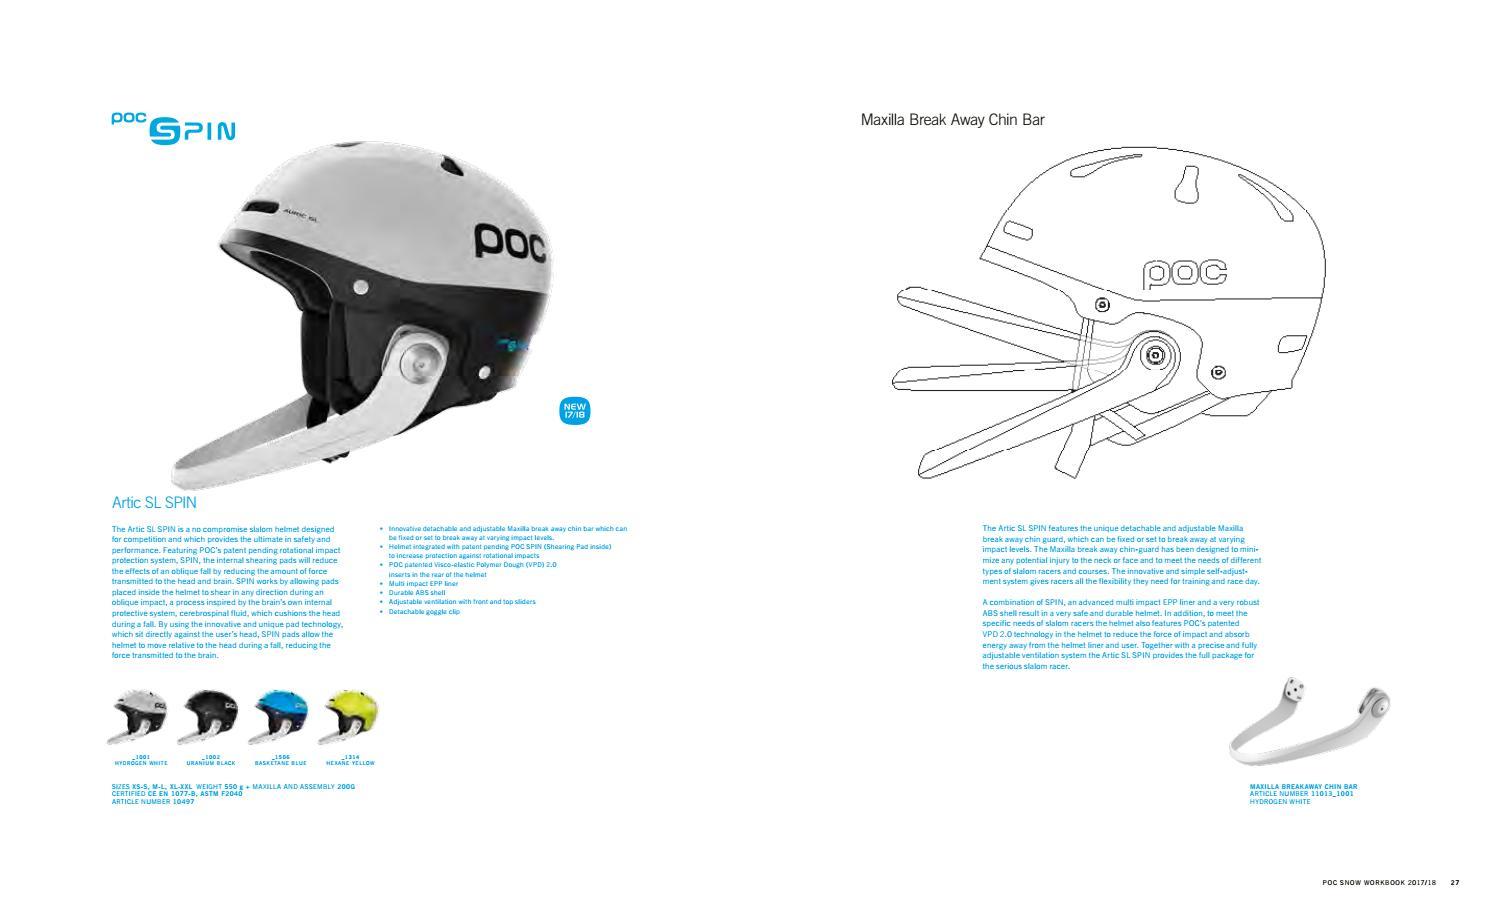 POC katalog 2017-2018 by skirace sk (professionalsport